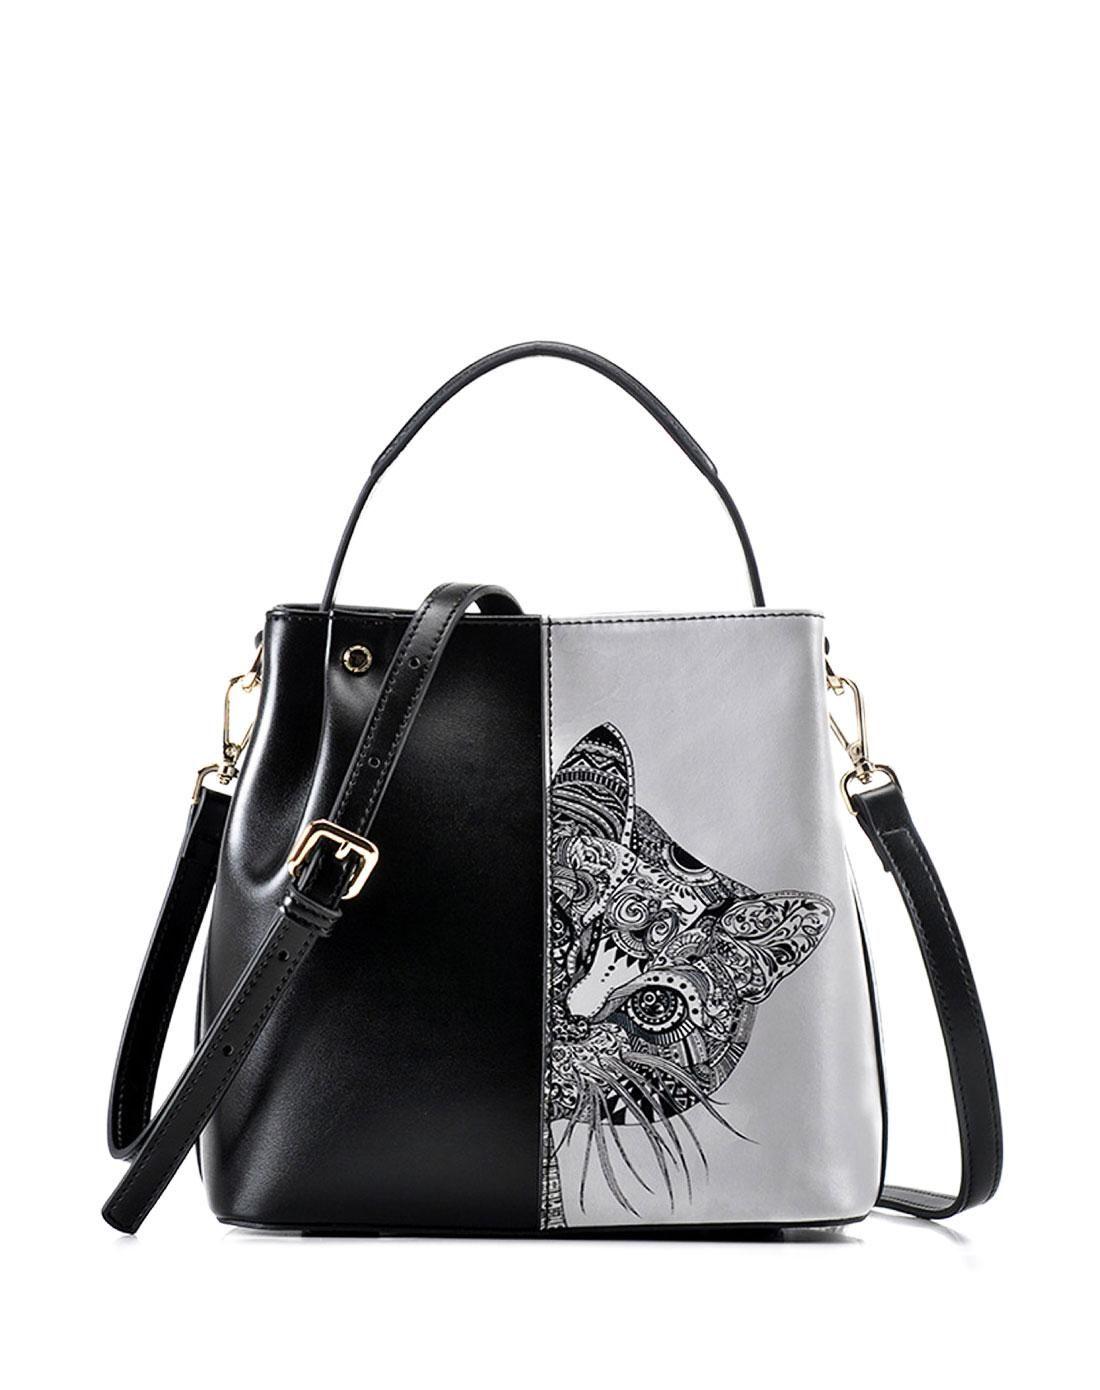 AdoreWe  VIPme Shoulder Bags - QIANBH Black White Contrast Tribal Cat  Handbag Shoulder Bag - AdoreWe.com 35d659de63663